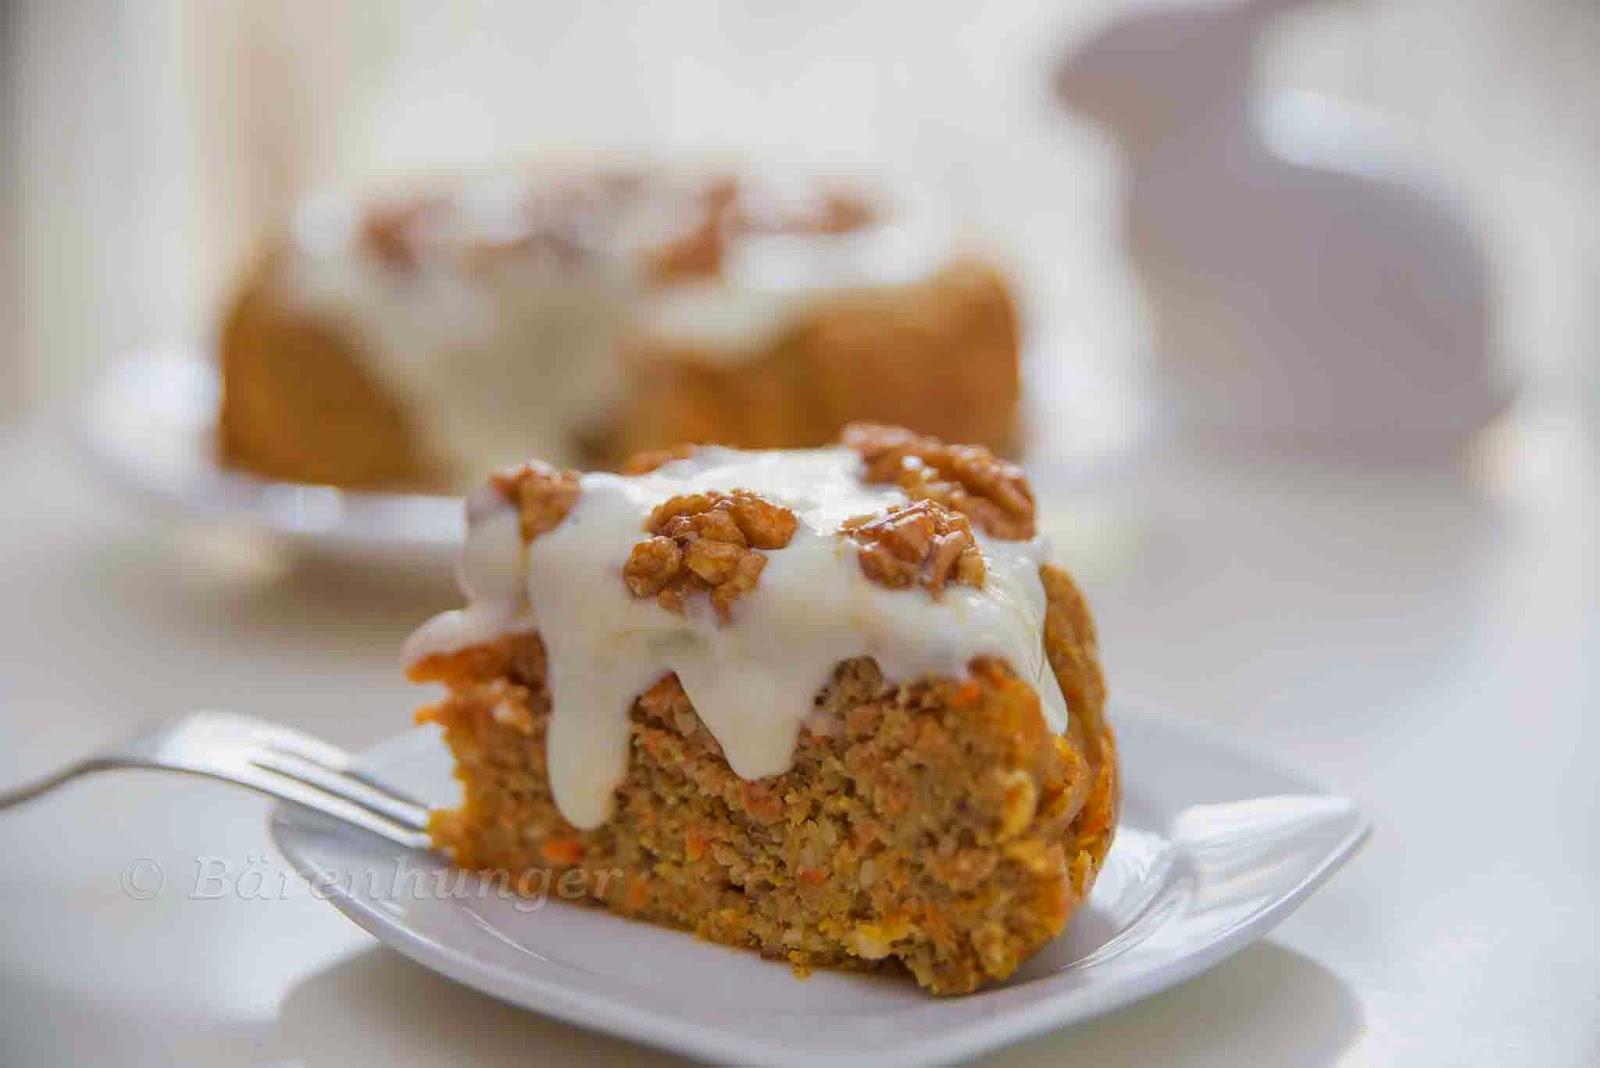 Karotten Walnuss Kuchen Barenhunger